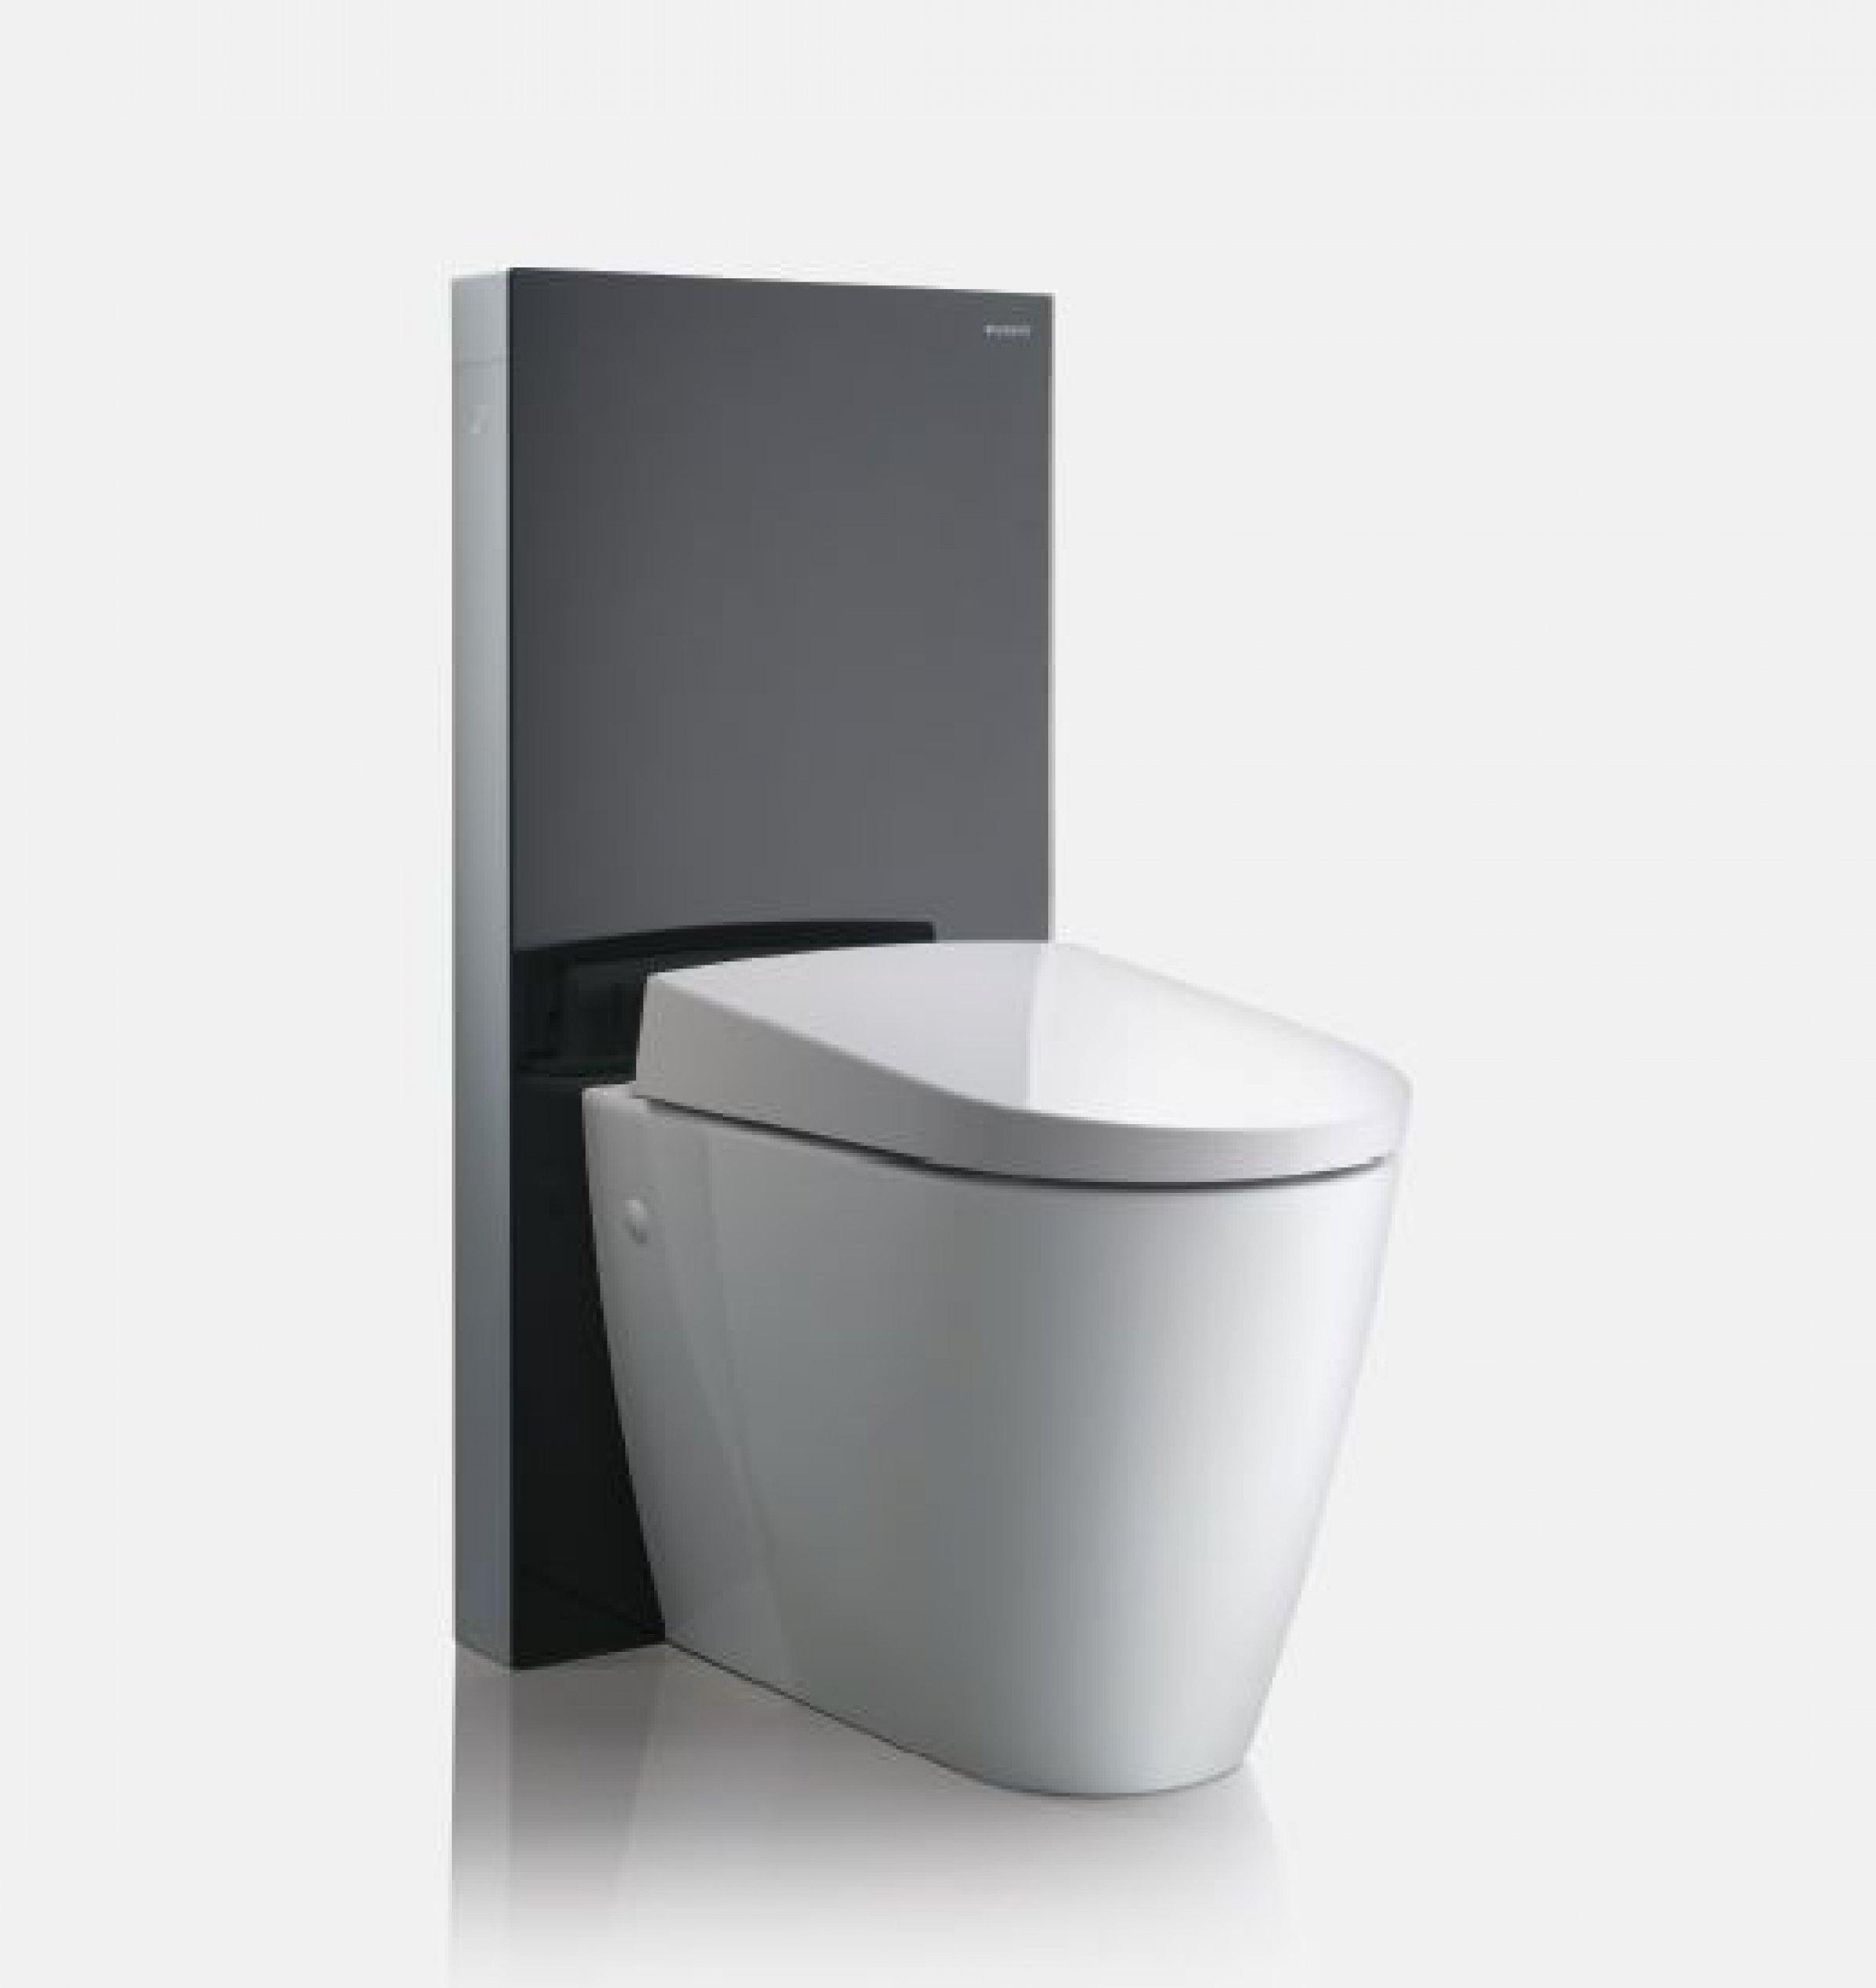 Mega Nyt gulvstående douchetoilet | Installatør JN27